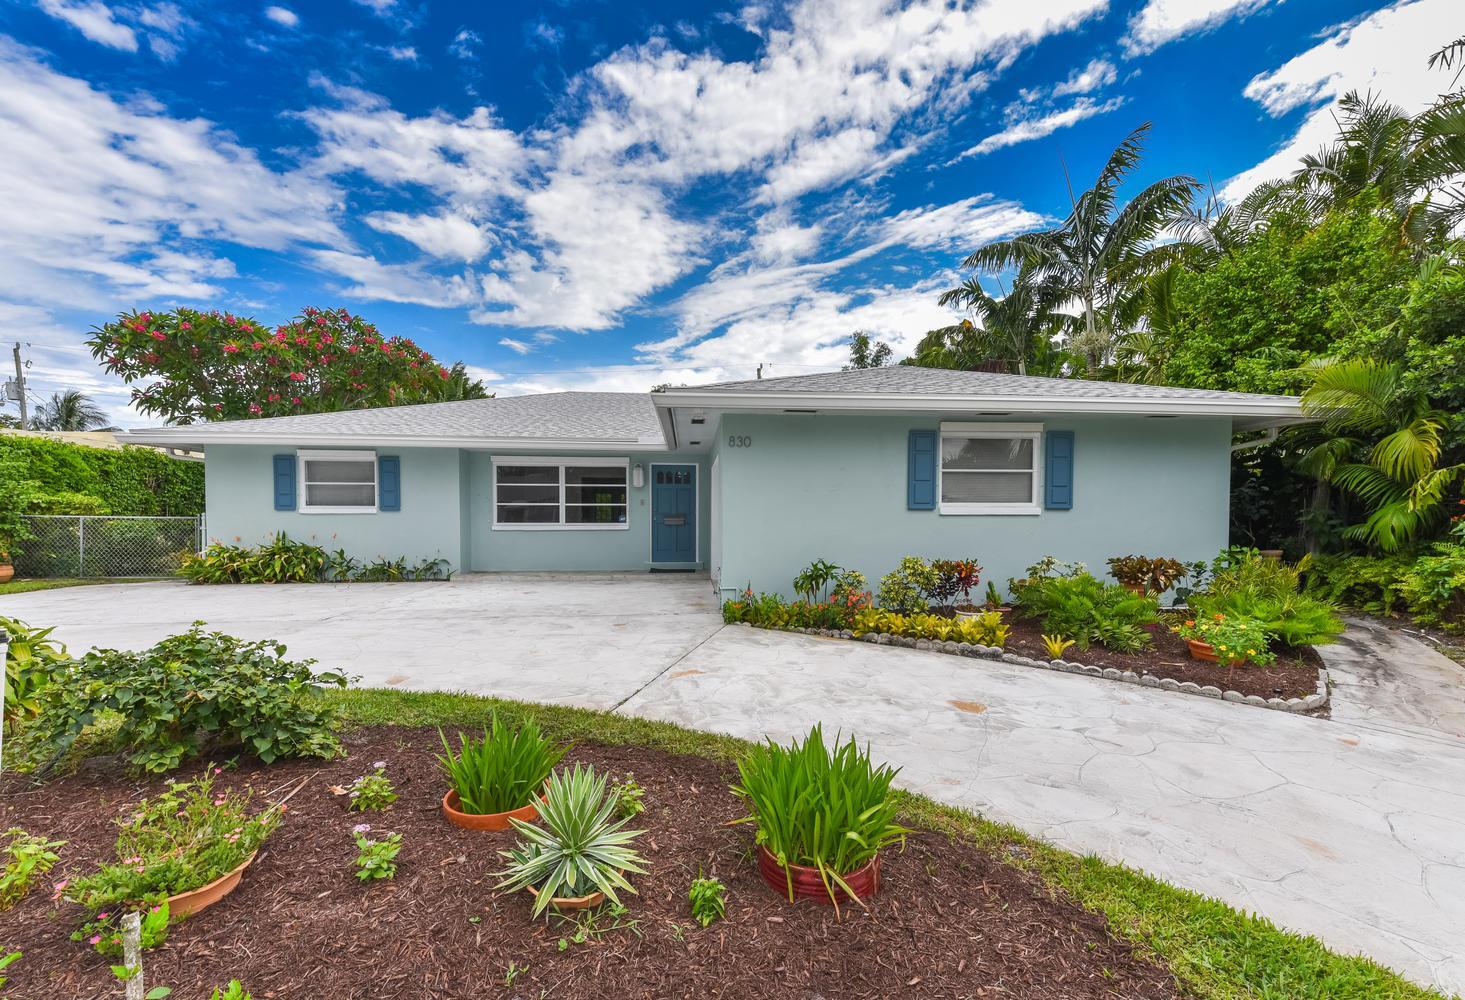 830 Claremore Drive West Palm Beach, FL 33401